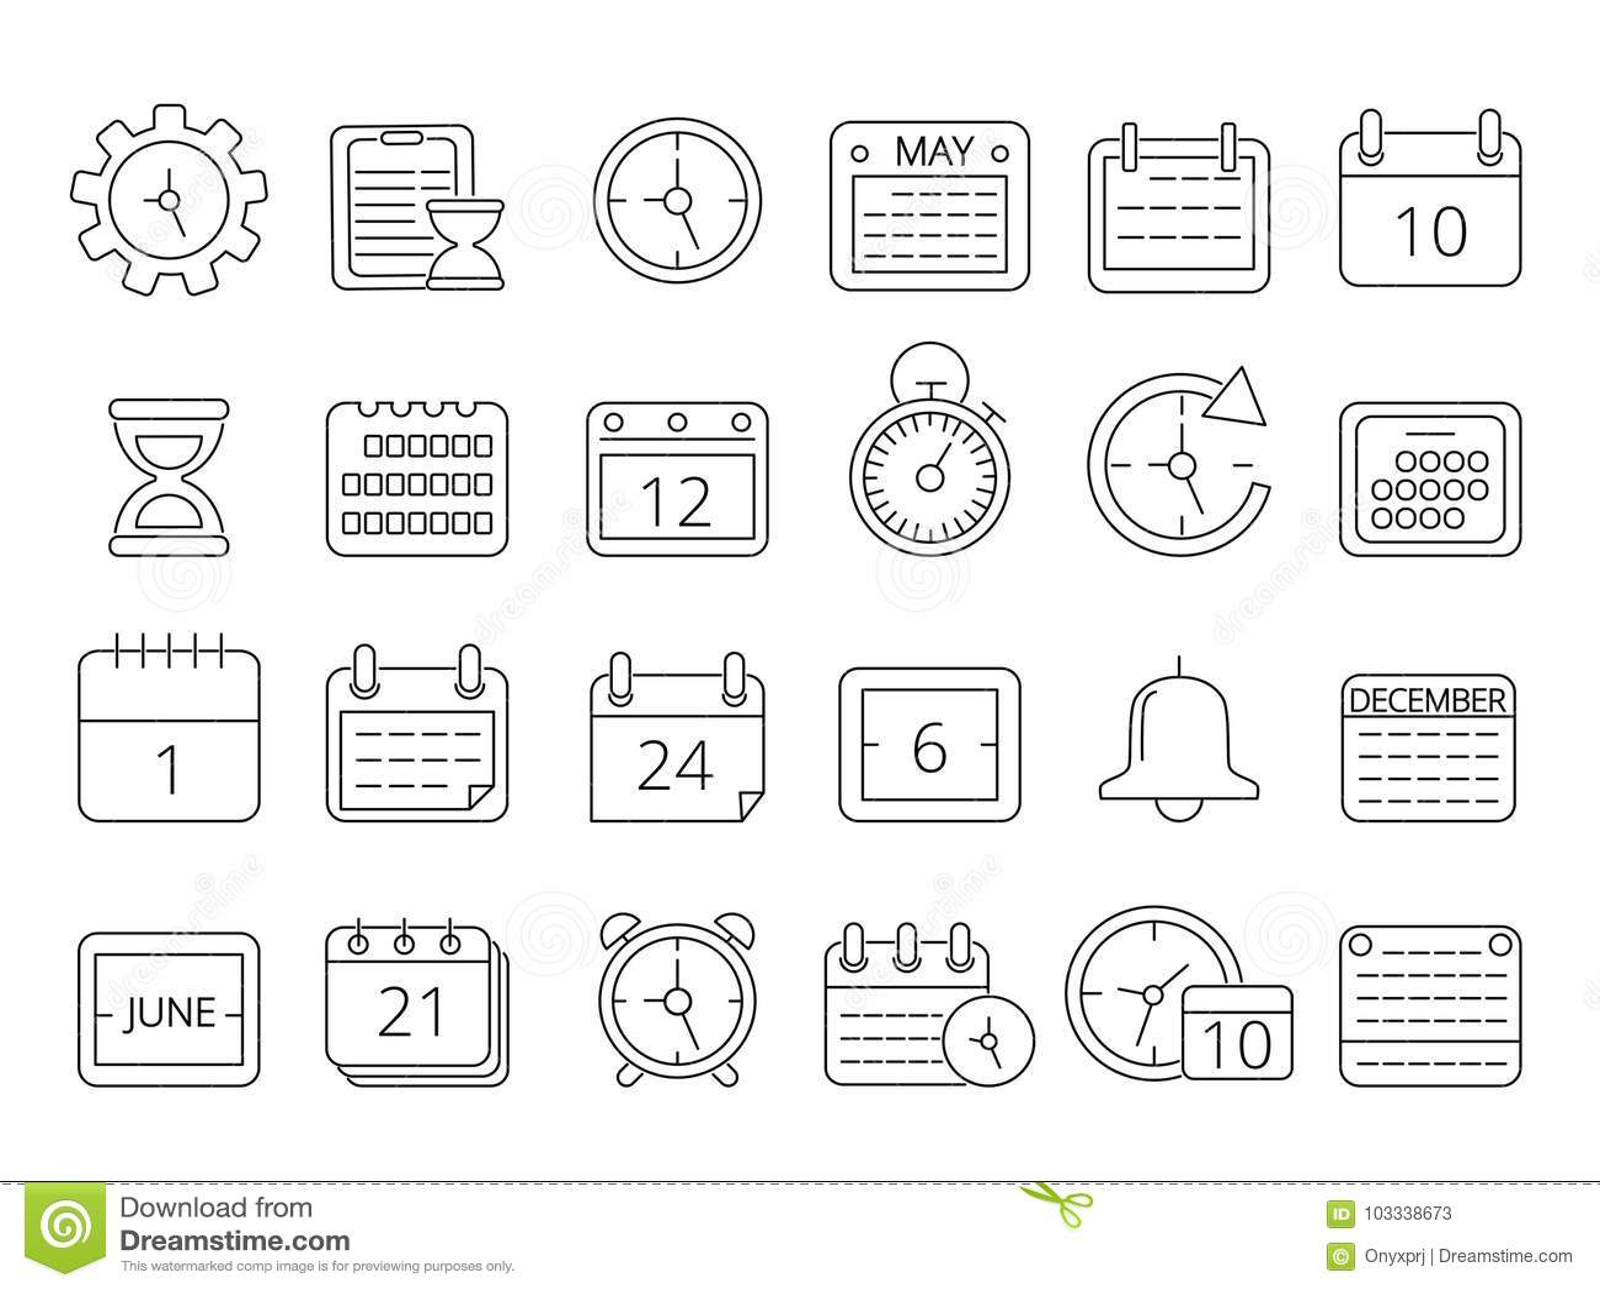 Mono Line Pictures Set Of Time Managements Symbols Stock Vector